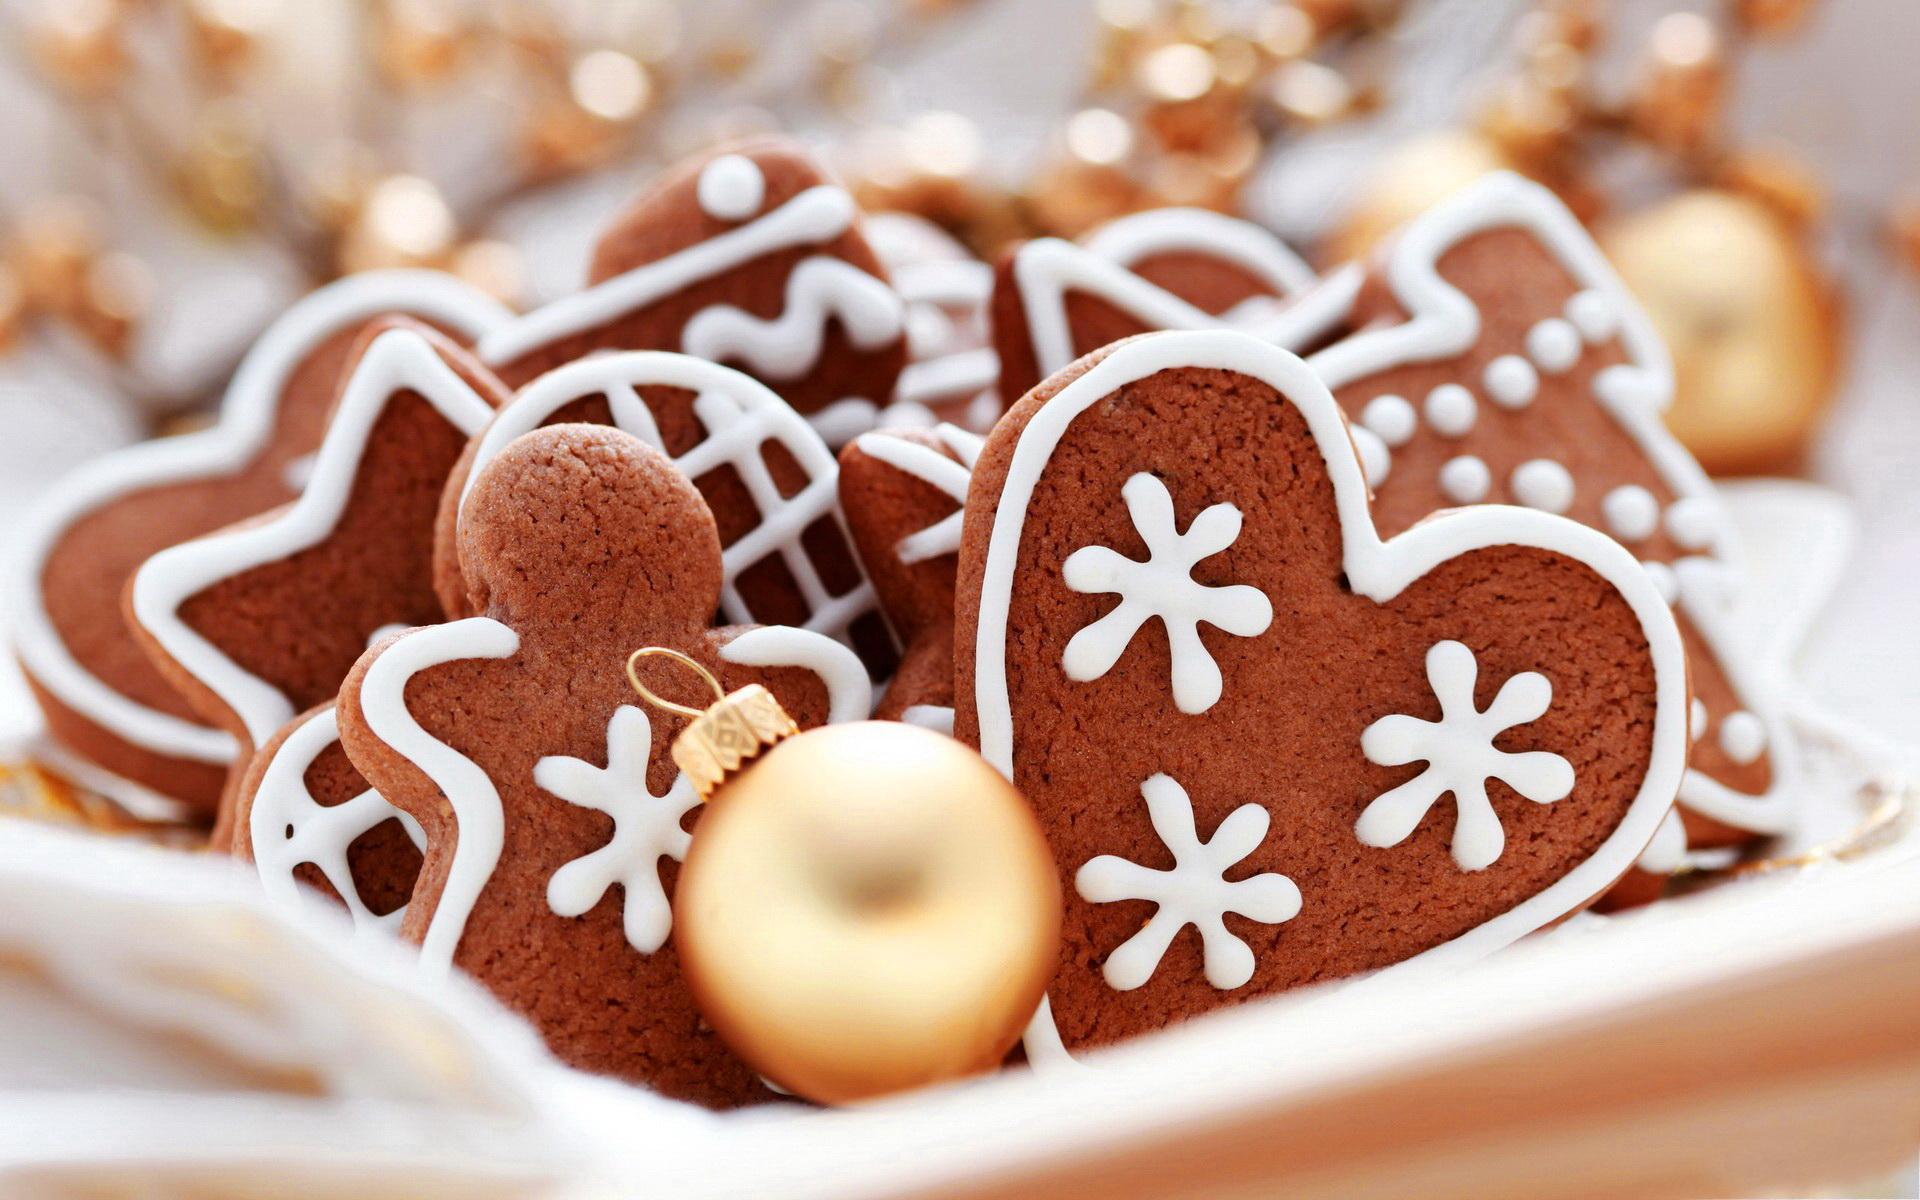 Christmas Cookies Wallpaper  Cute Pastry wallpaper